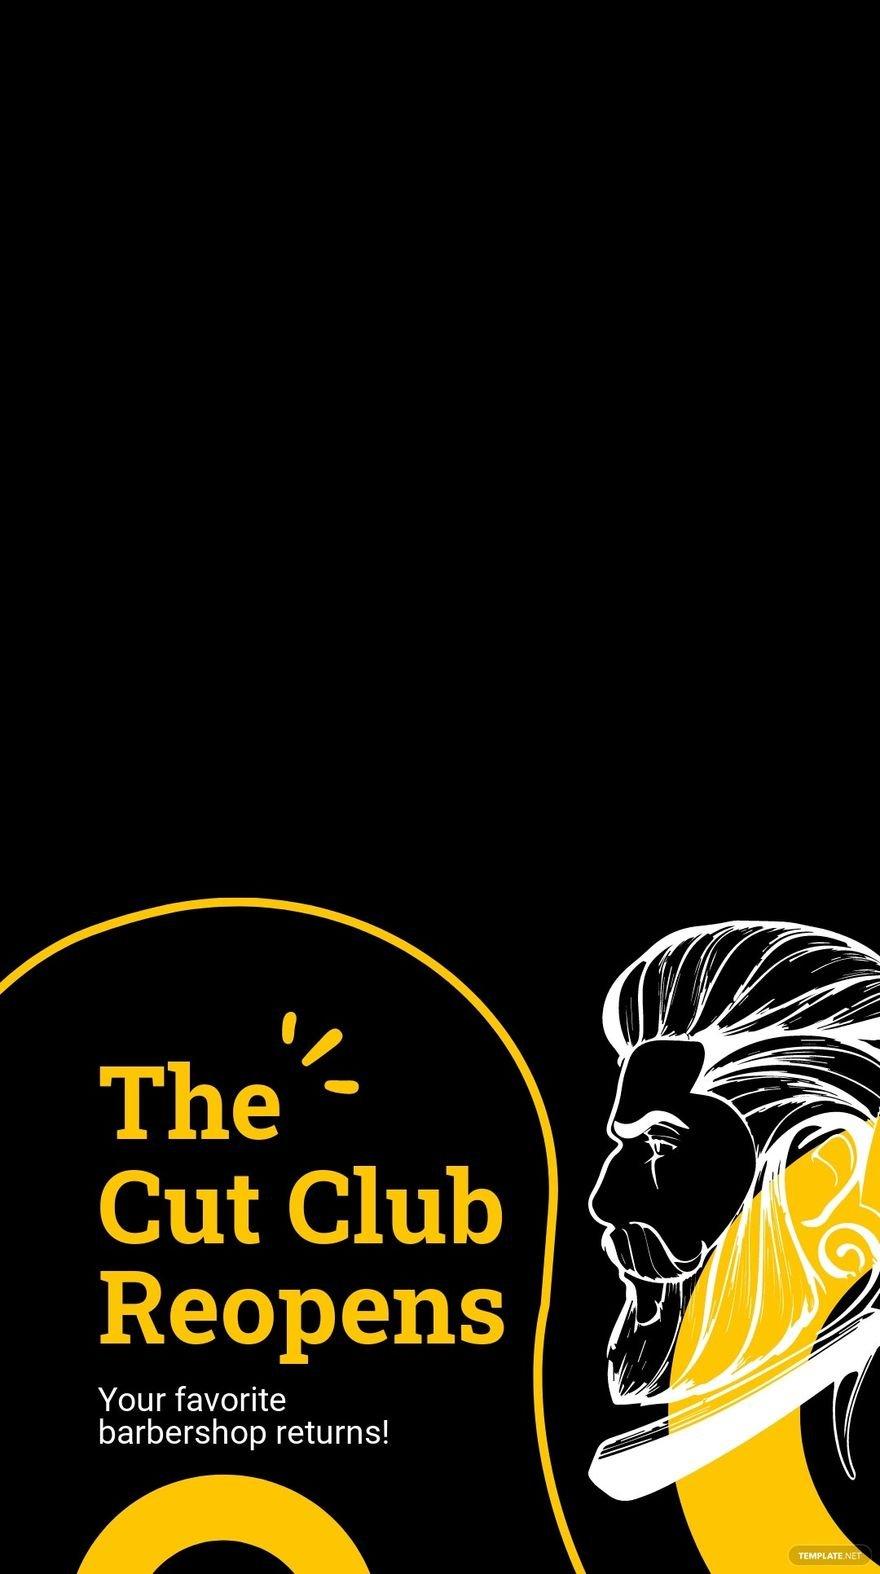 Barbershop Reopening Snapchat Geofilter Template.jpe